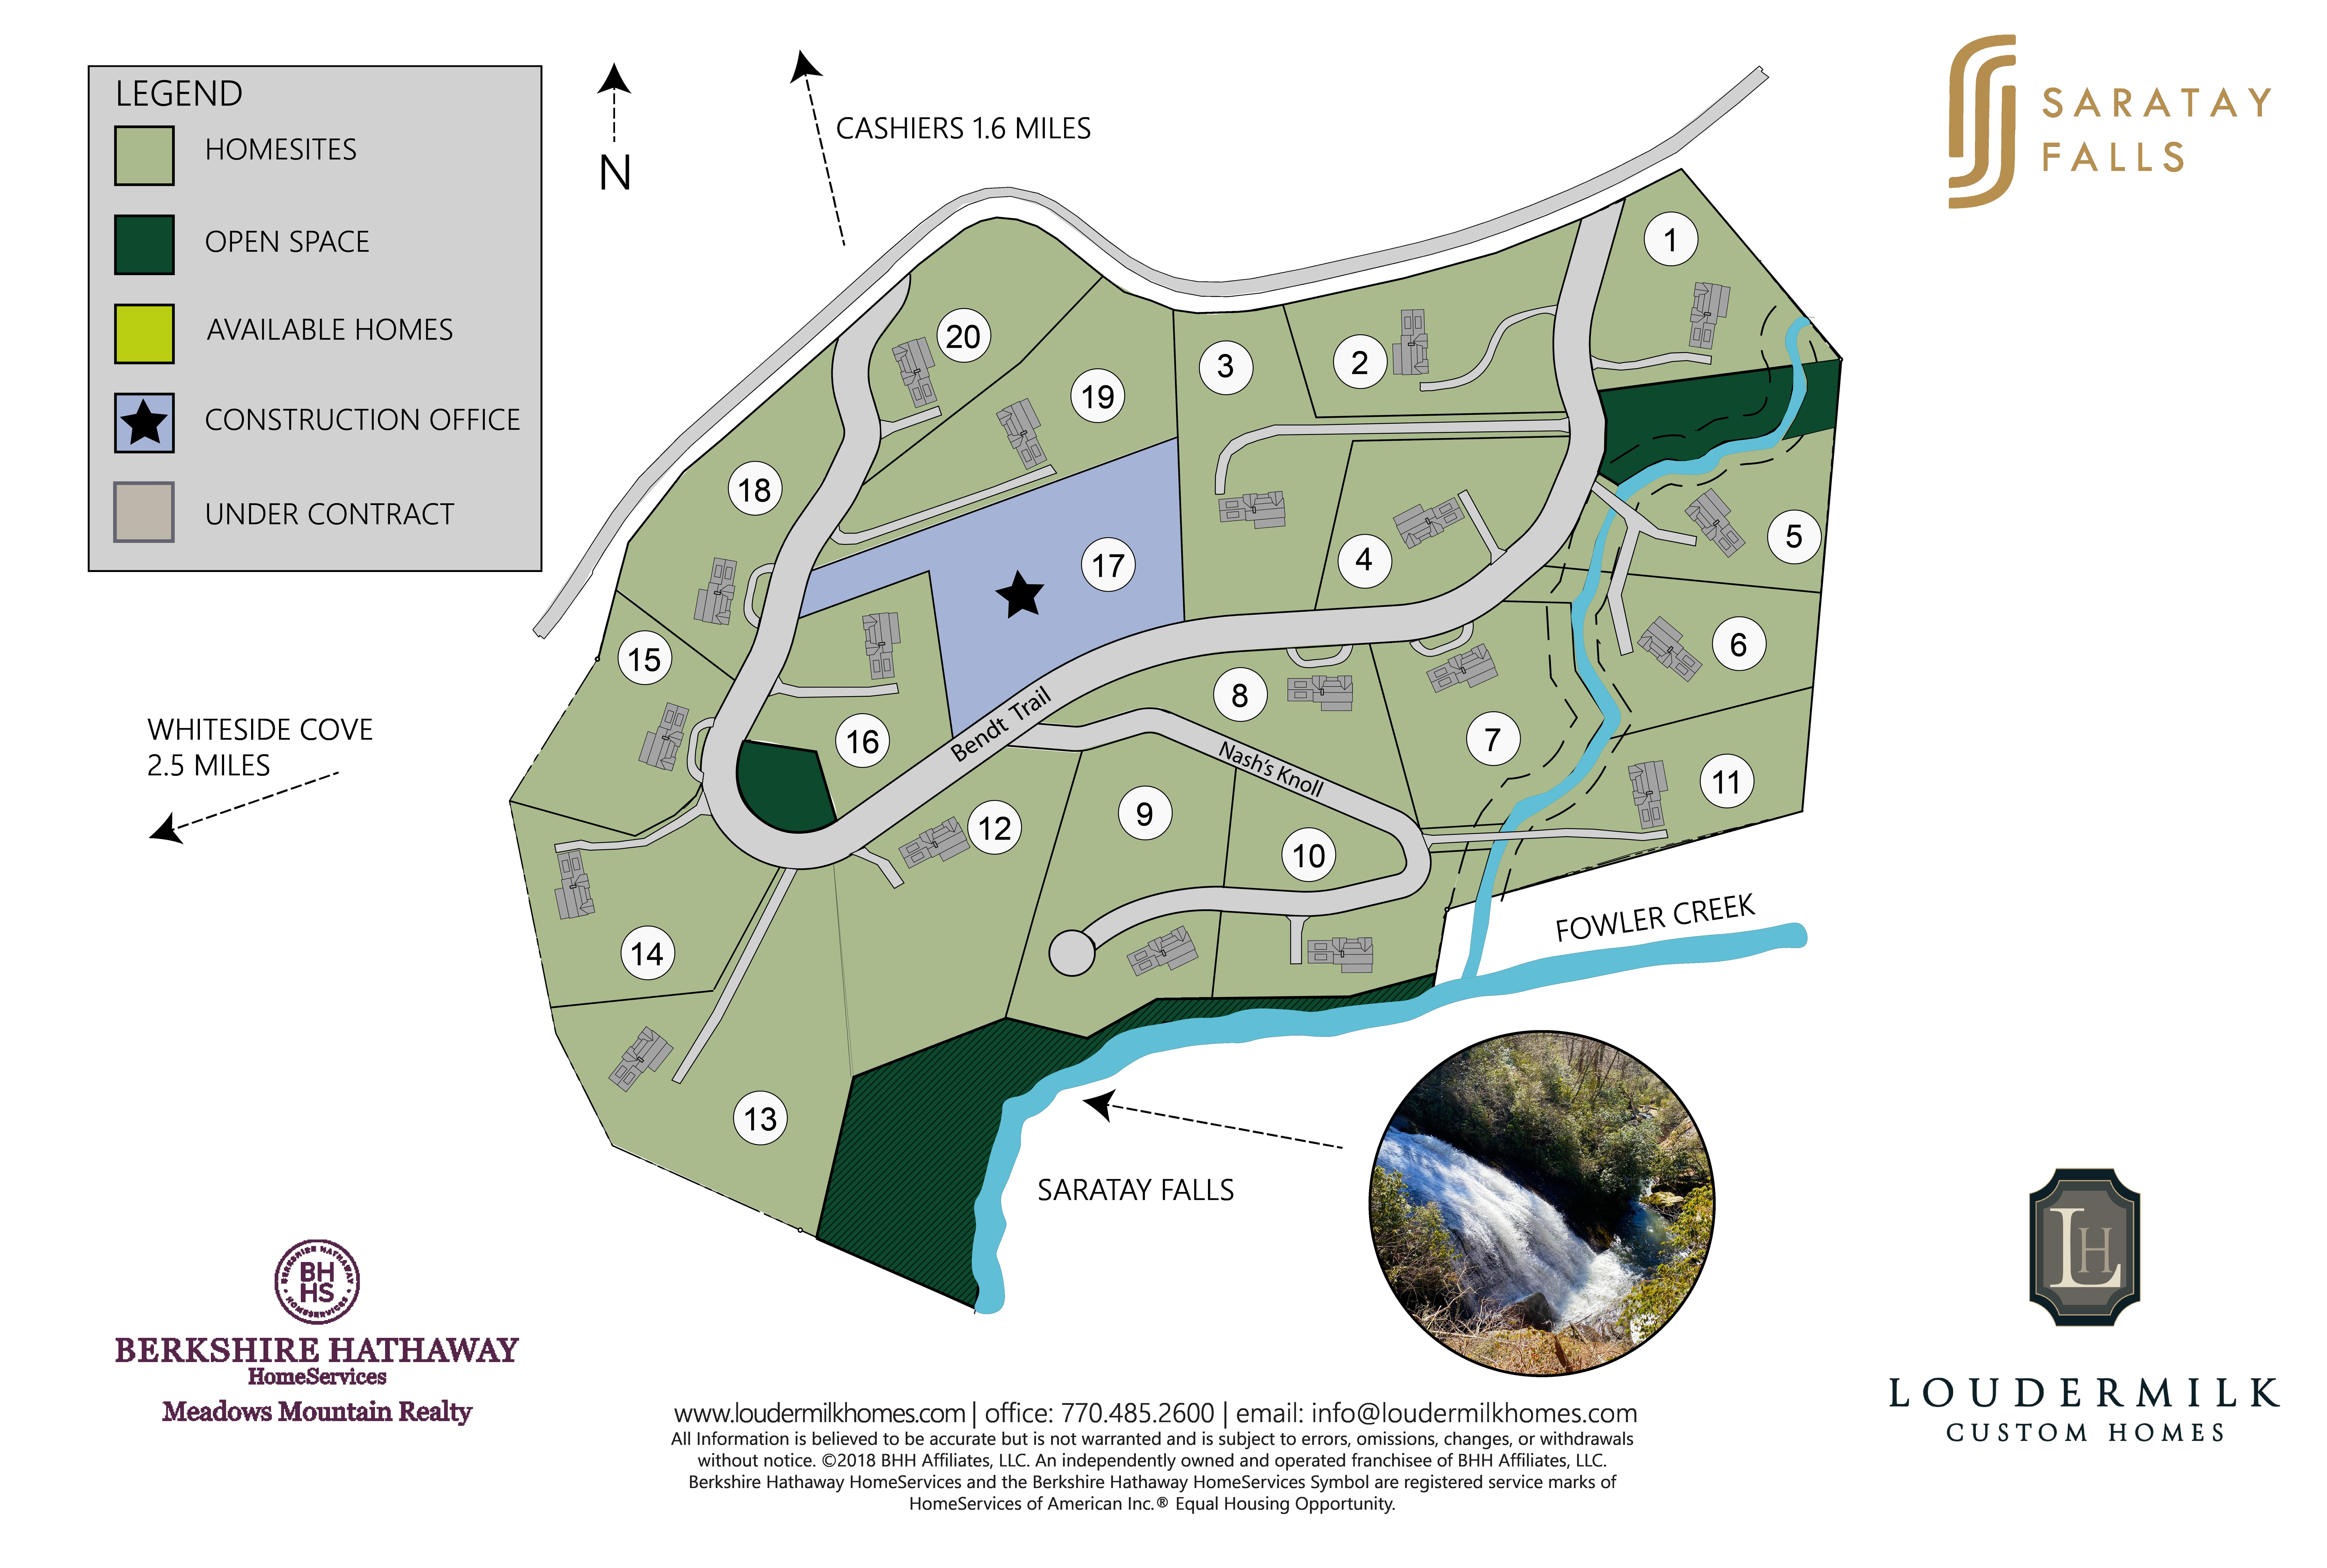 saratay-falls-site-plan